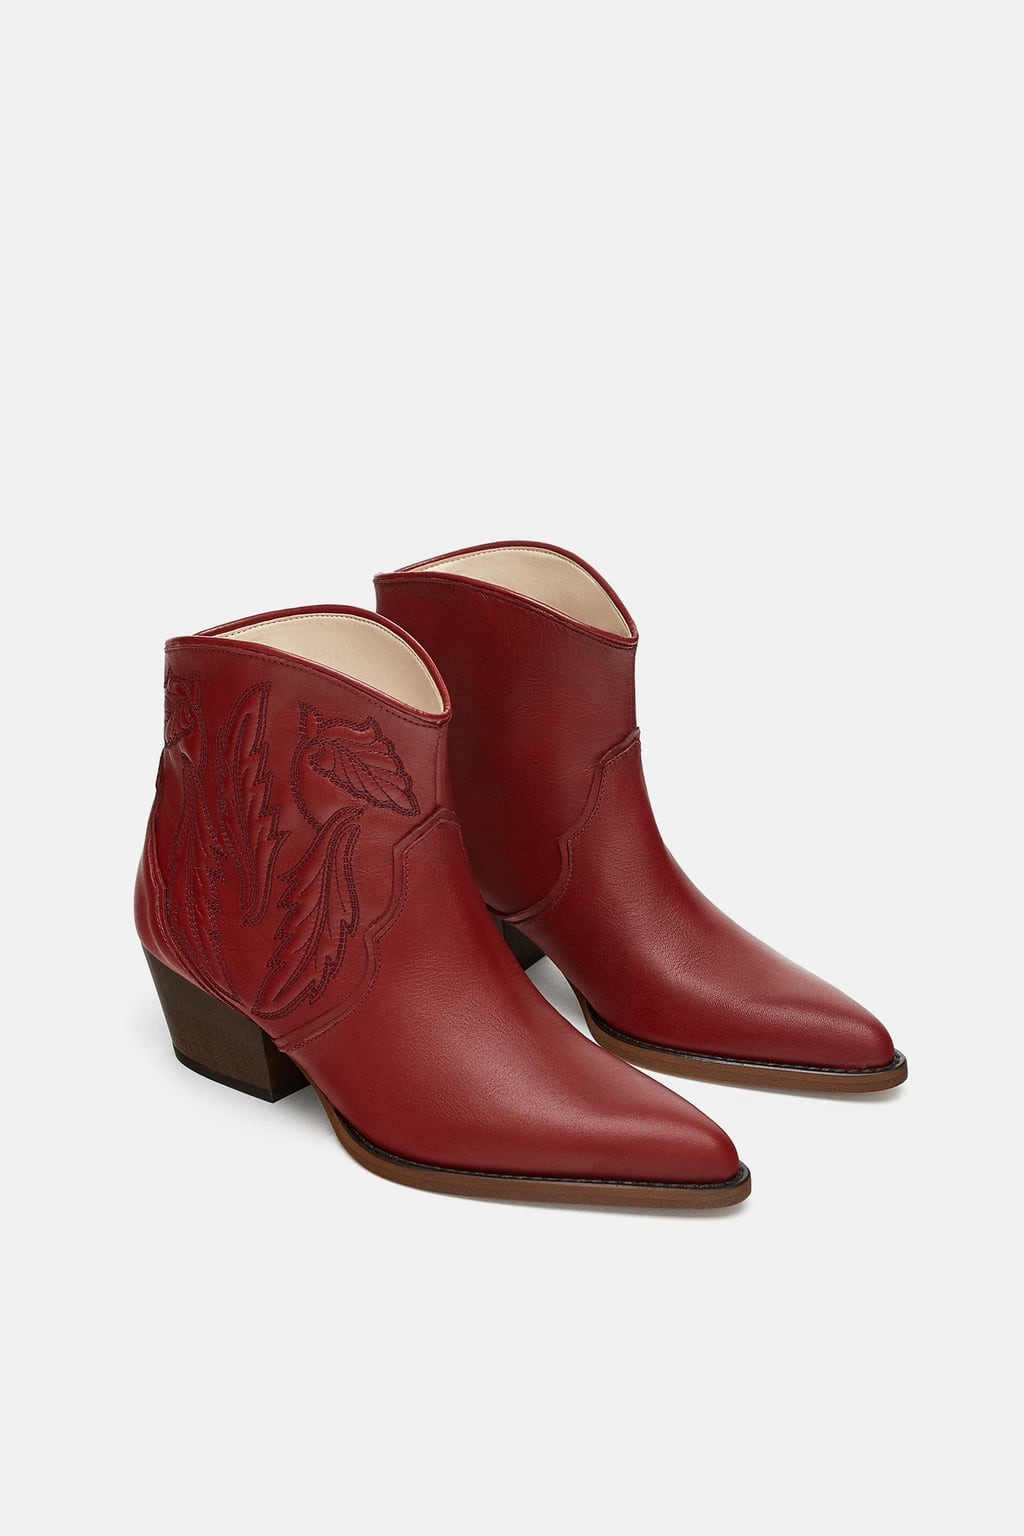 c3faf2521c2 botín rojo de zara cowboy